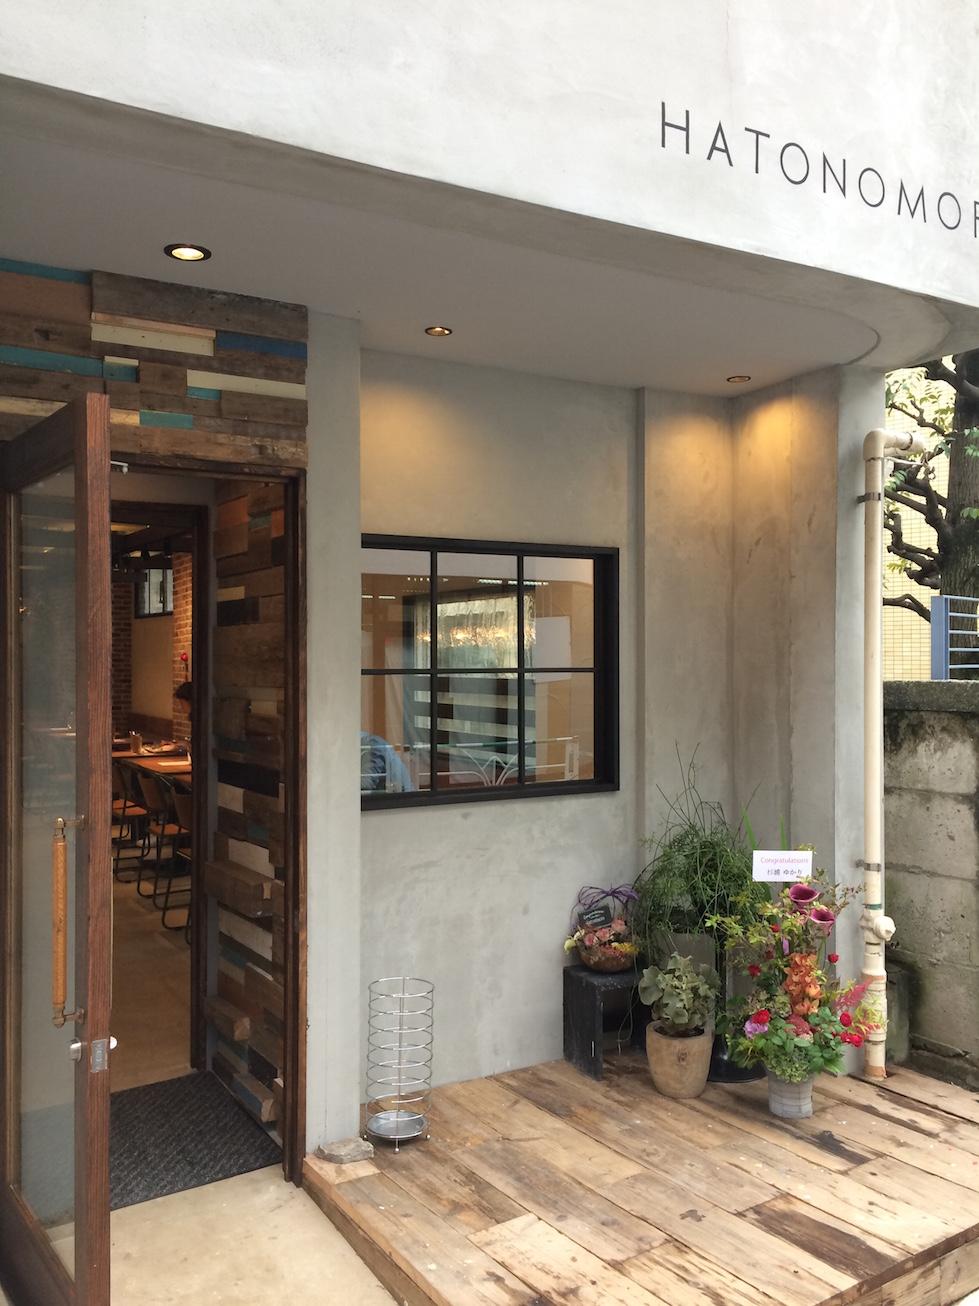 hatonomori_150905_1.jpg